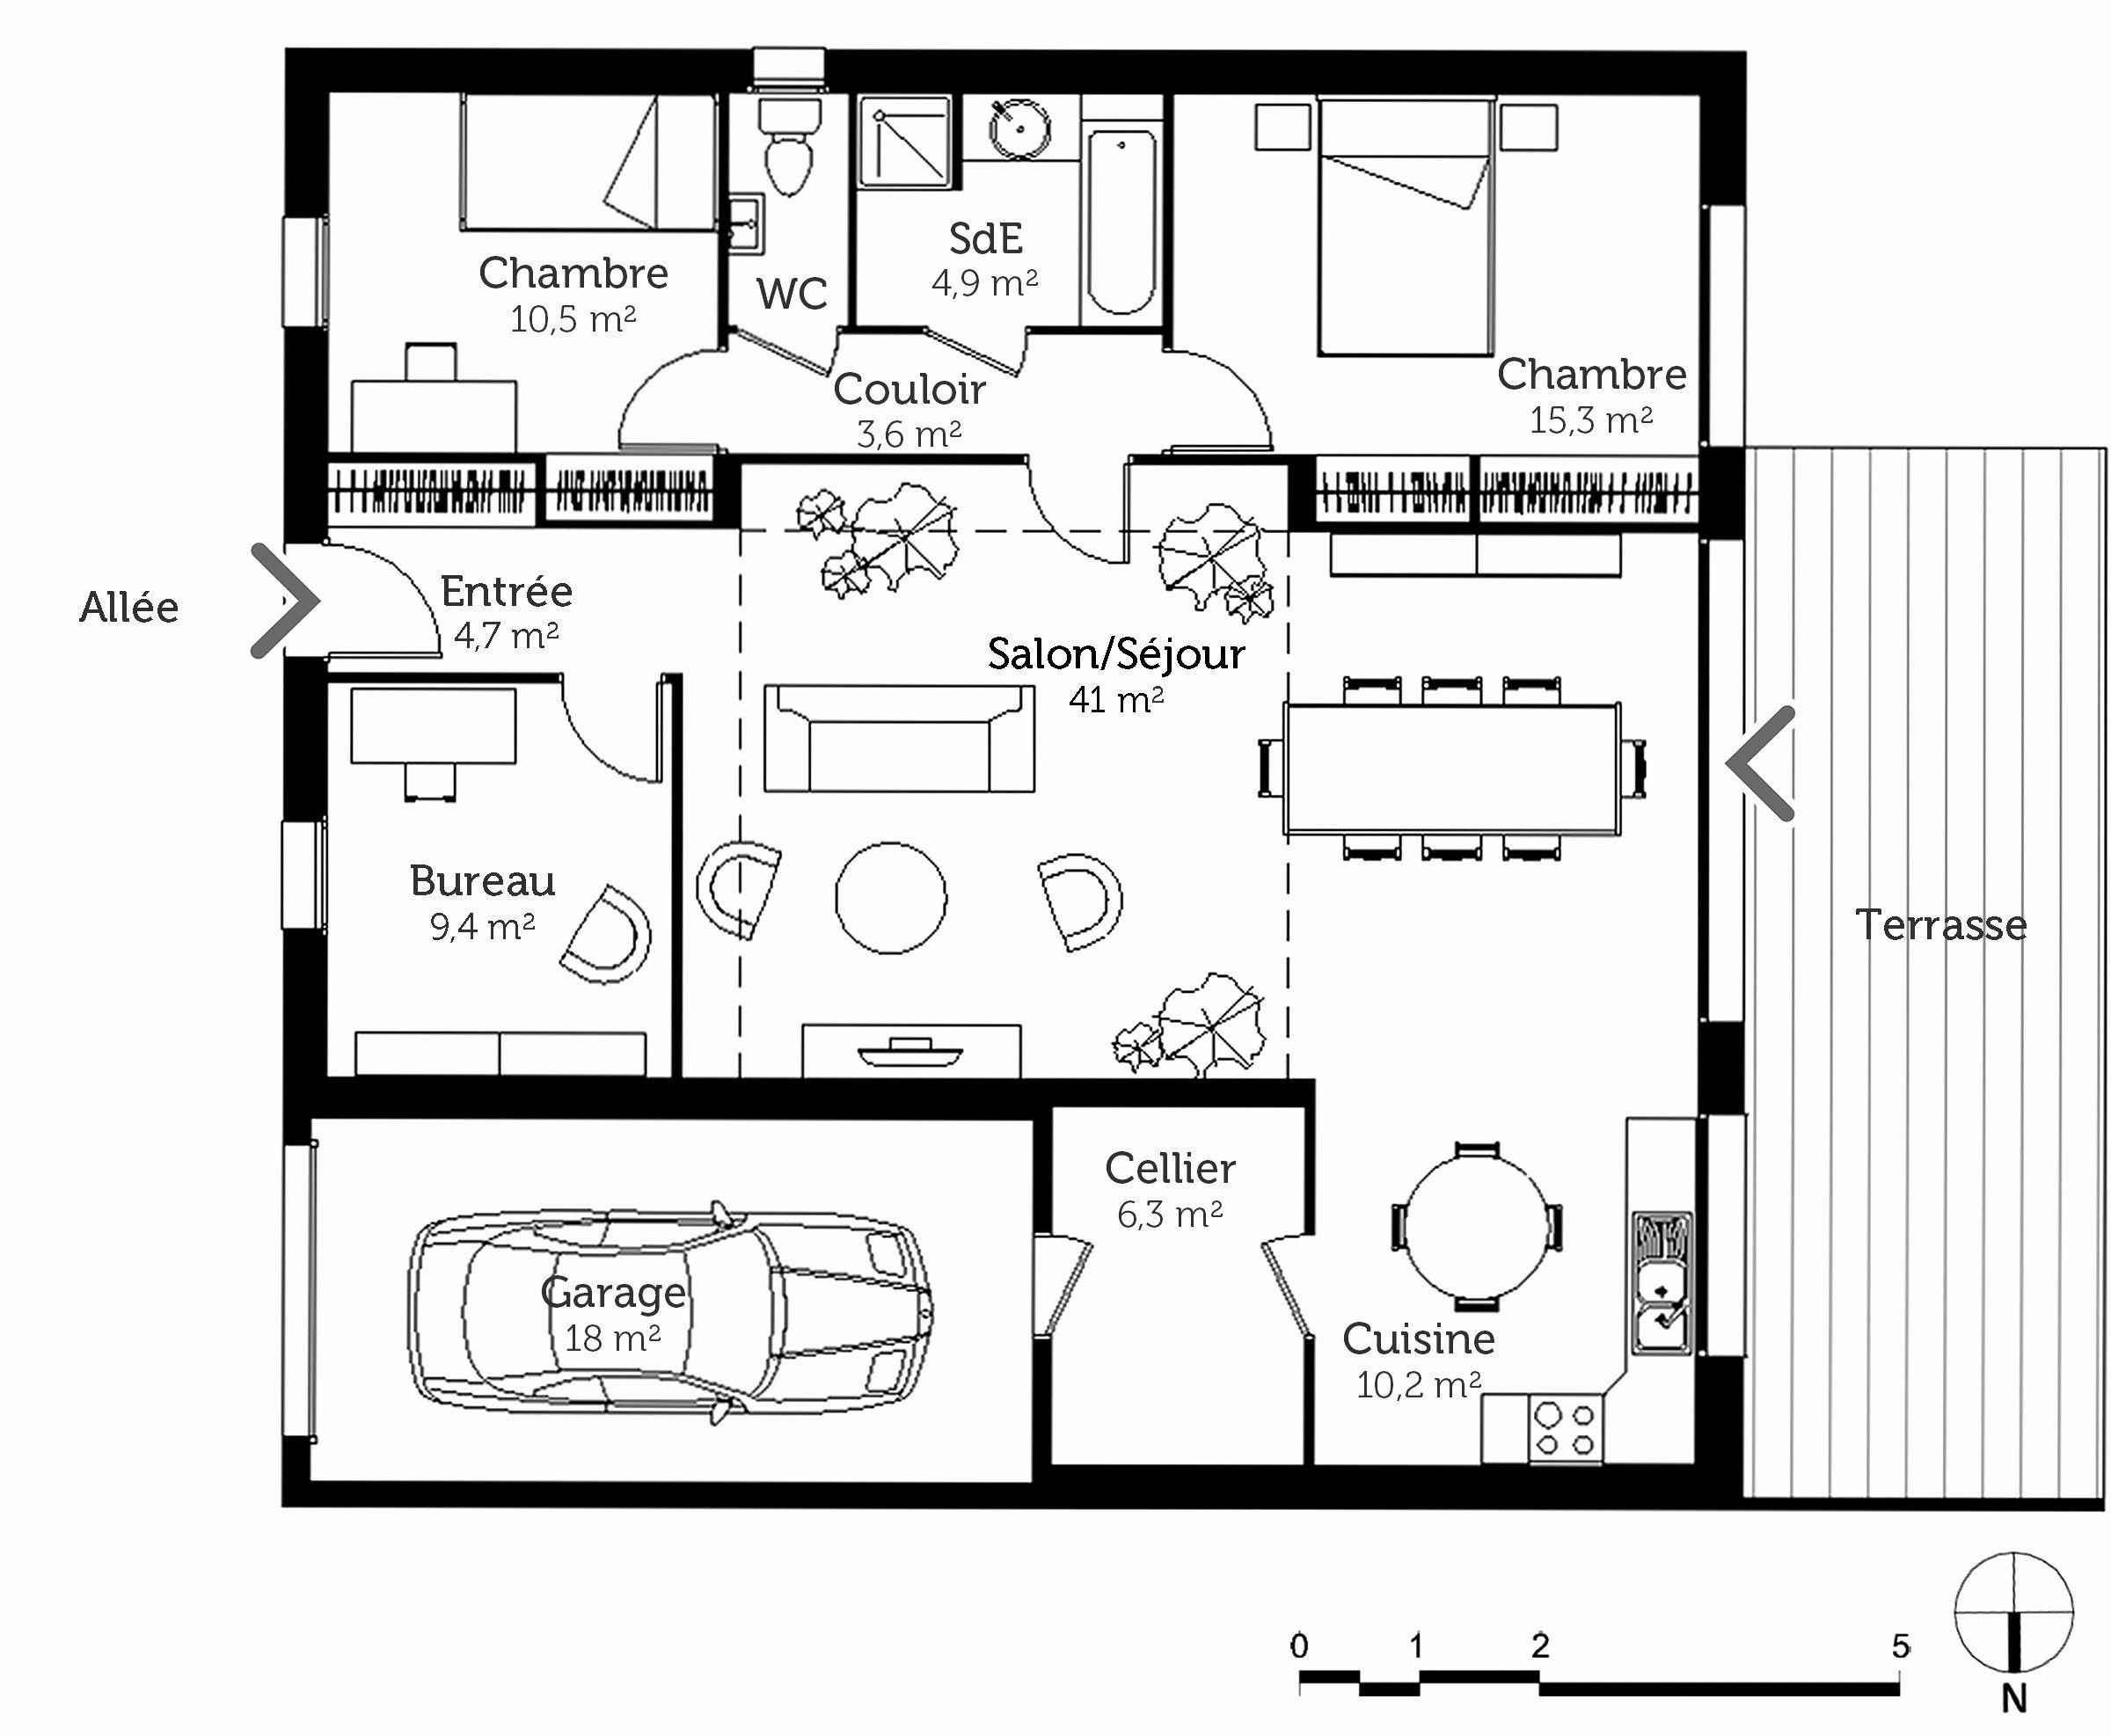 Lovely Plan Maison Plain Pied 4 Chambres 100m2 | Plan maison, Plan maison plain pied